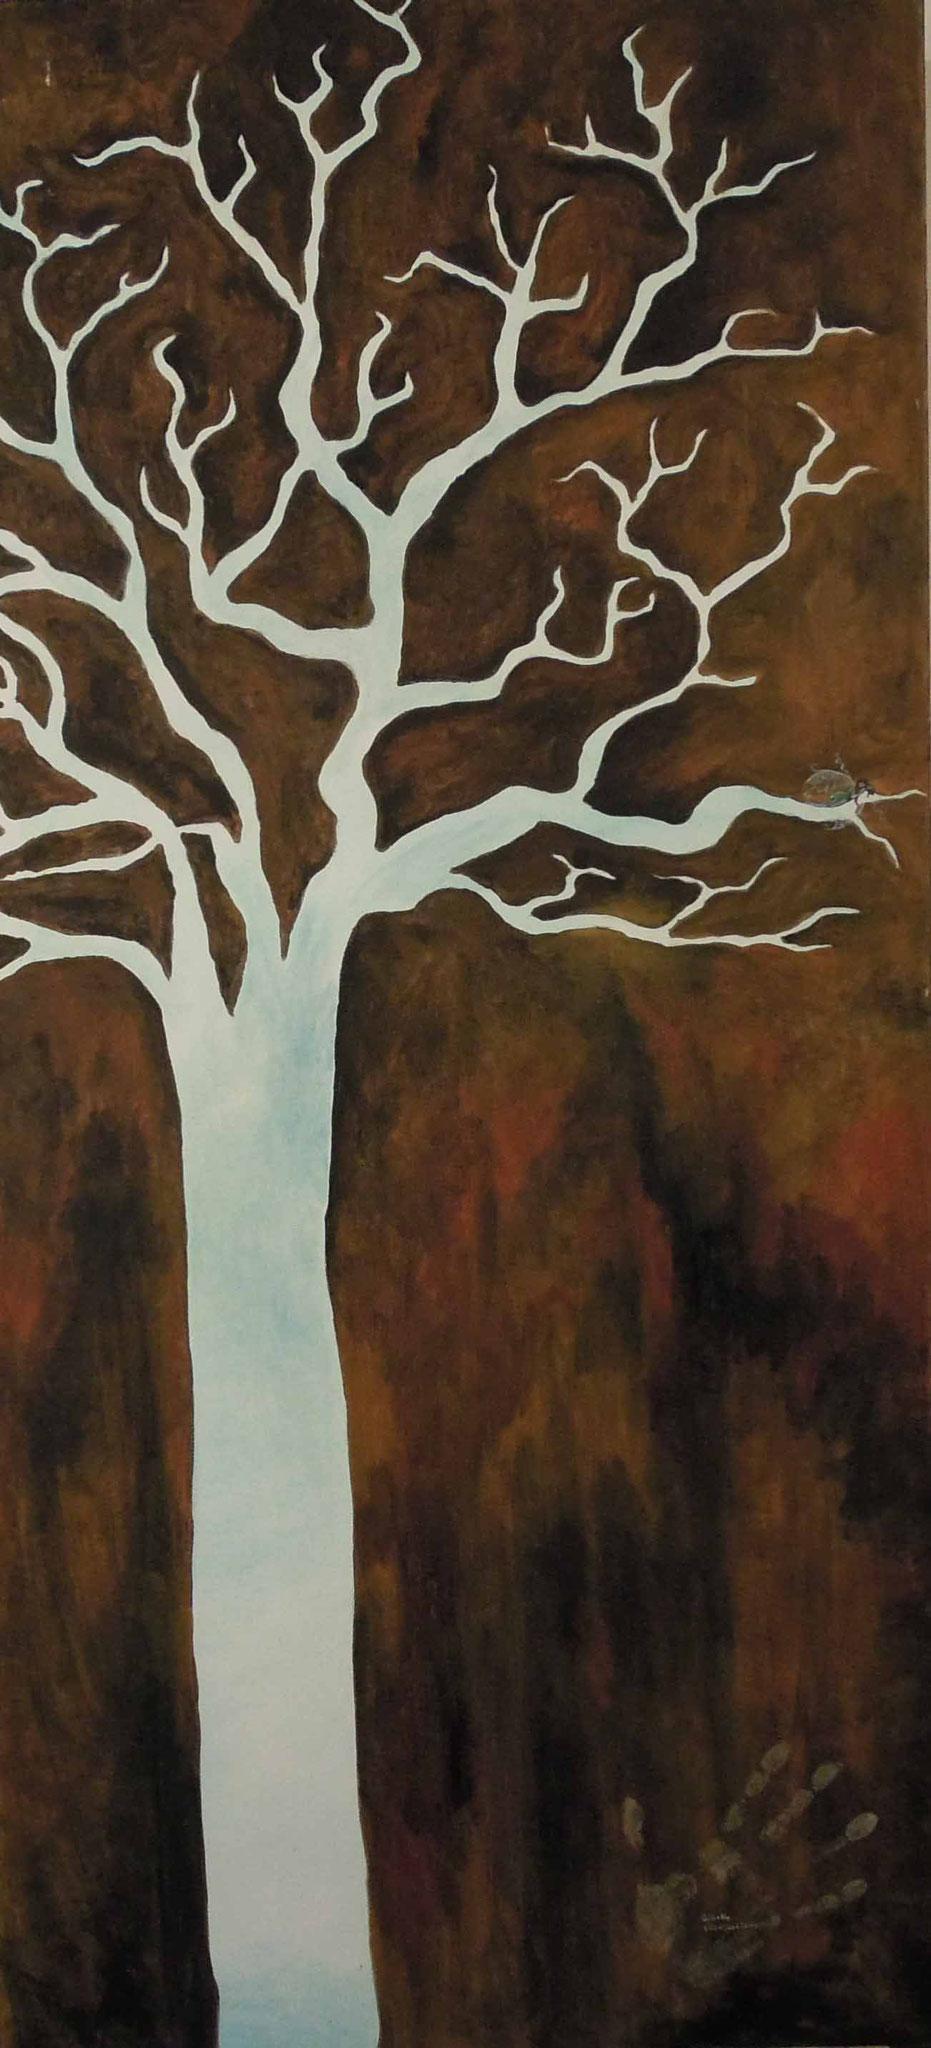 Waldfee - Öl auf Leinwand 60 x 130 cm